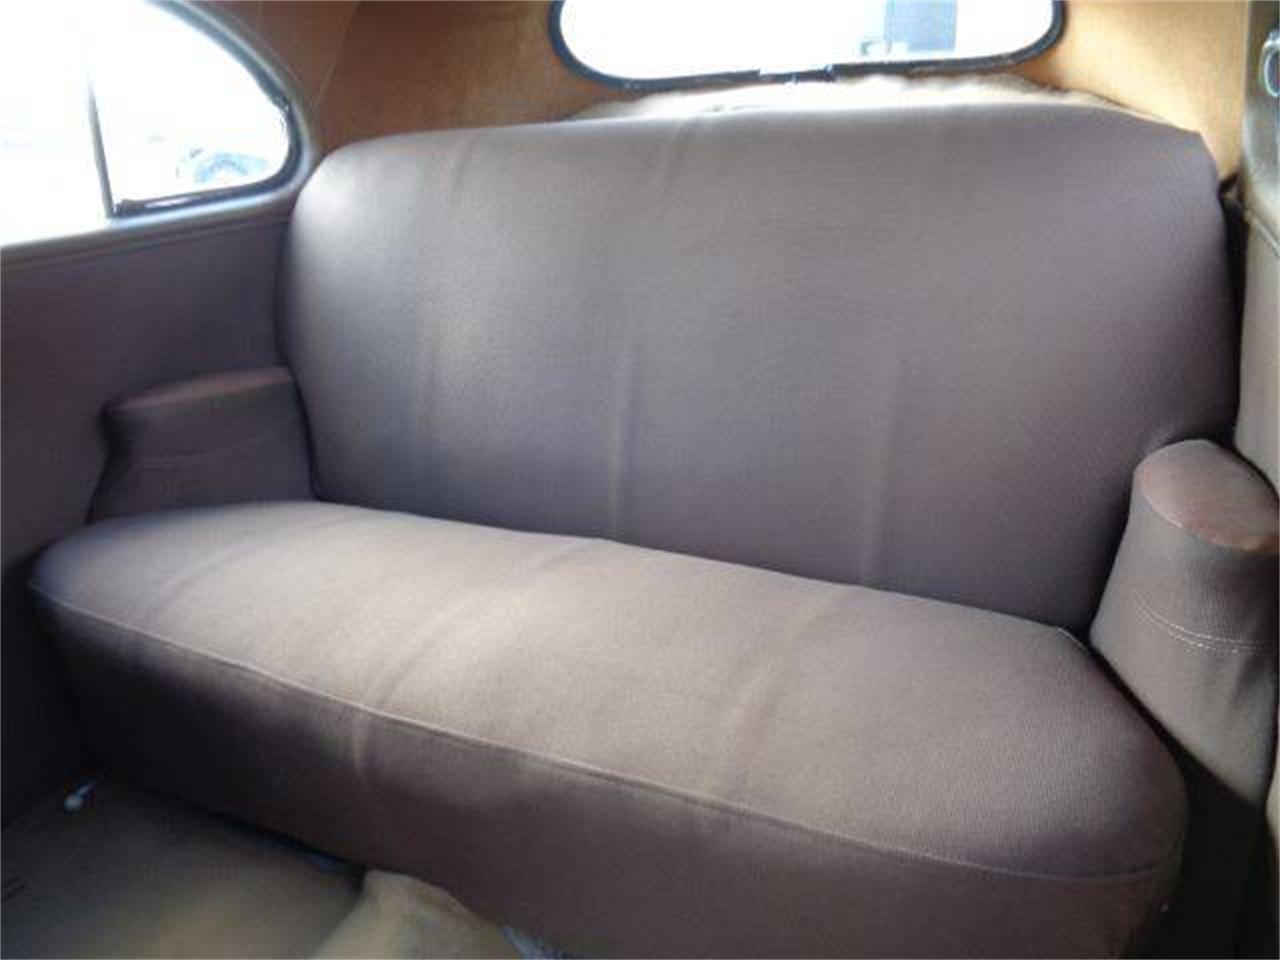 1941 Mercury 2-Dr Coupe (CC-1075788) for sale in Staunton, Illinois